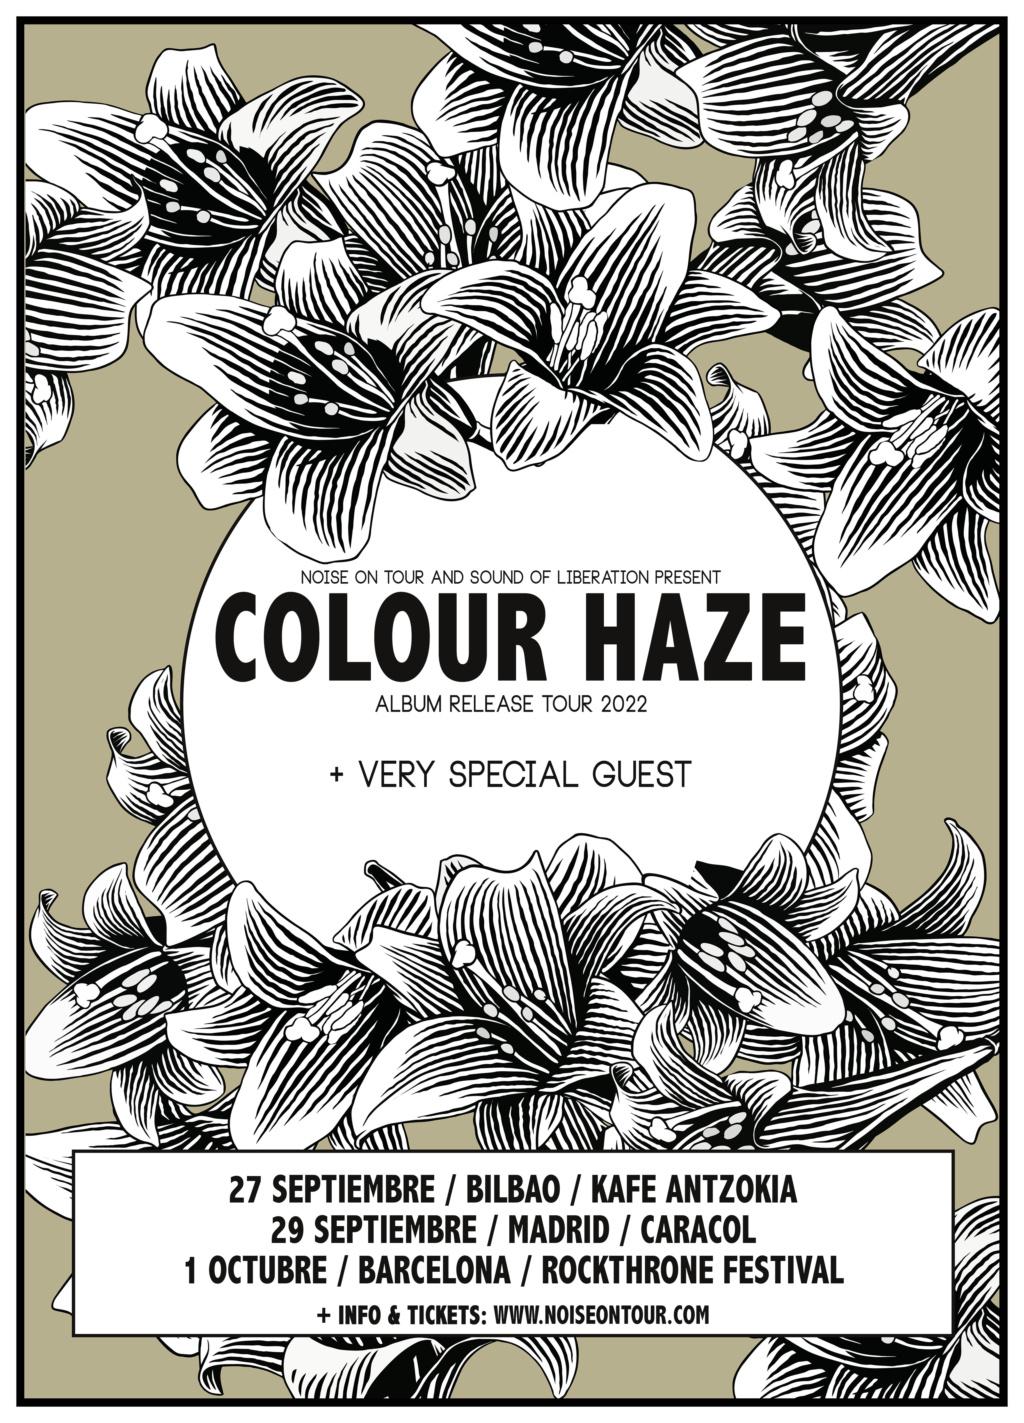 [ROCKTHRONE 2022] COLOUR HAZE + UNIDA + YAWNING MAN (TBC) + SATURNA   30/Sept + 1/Oct 2022   BARCELONA - Página 2 Colour12